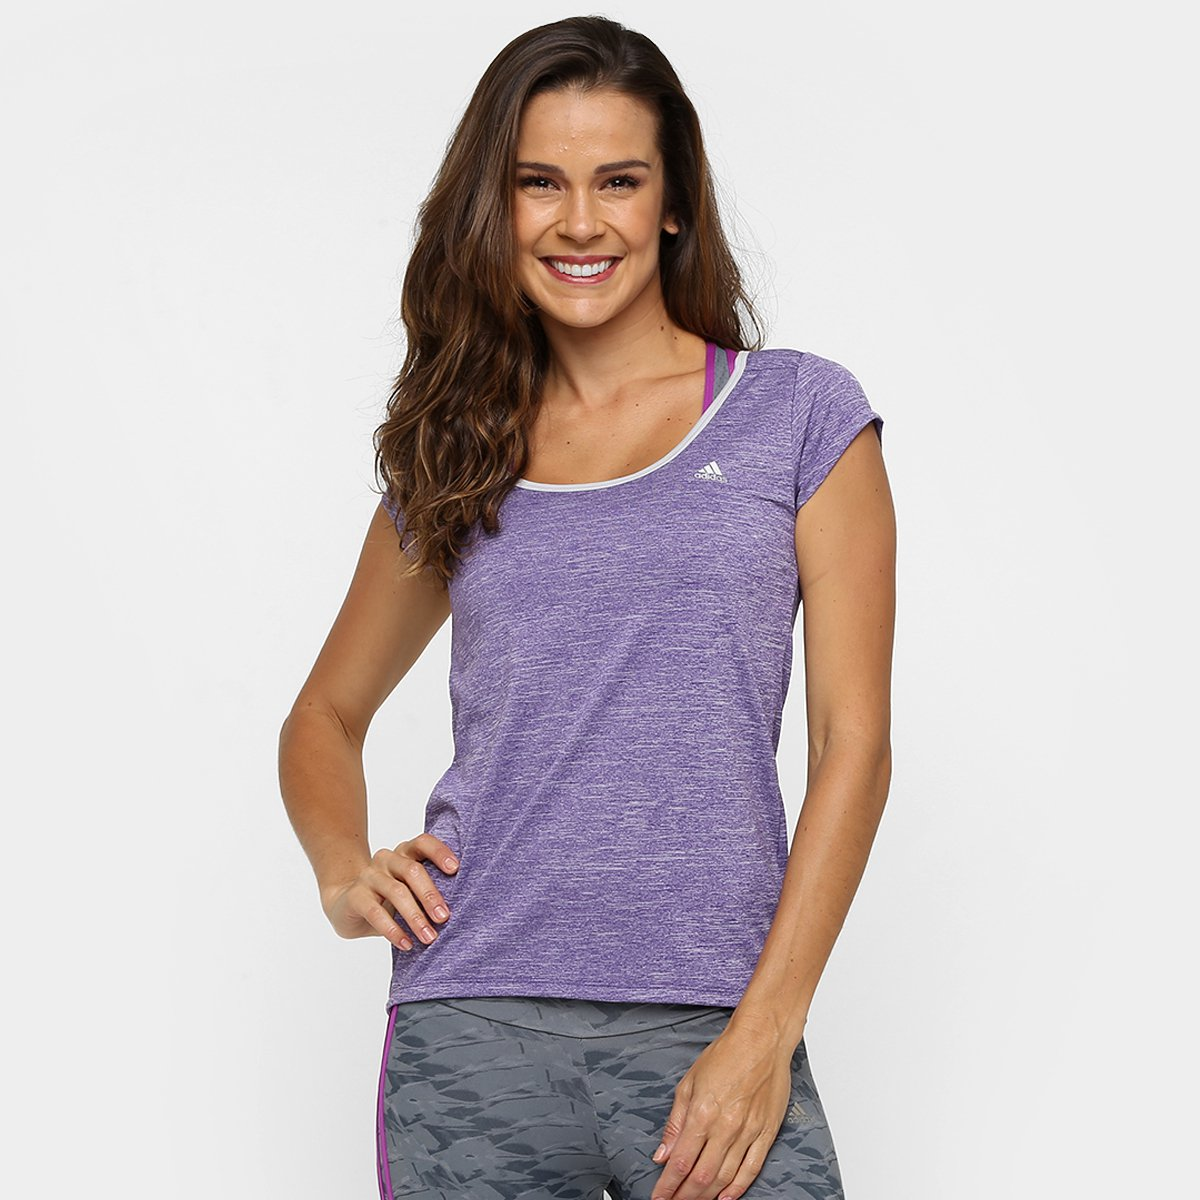 Roxo Camiseta Roxo Mescla Feminina Feminina Clima Ess Clima Adidas Camiseta Ess Adidas Adidas Mescla Camiseta FwTHxg